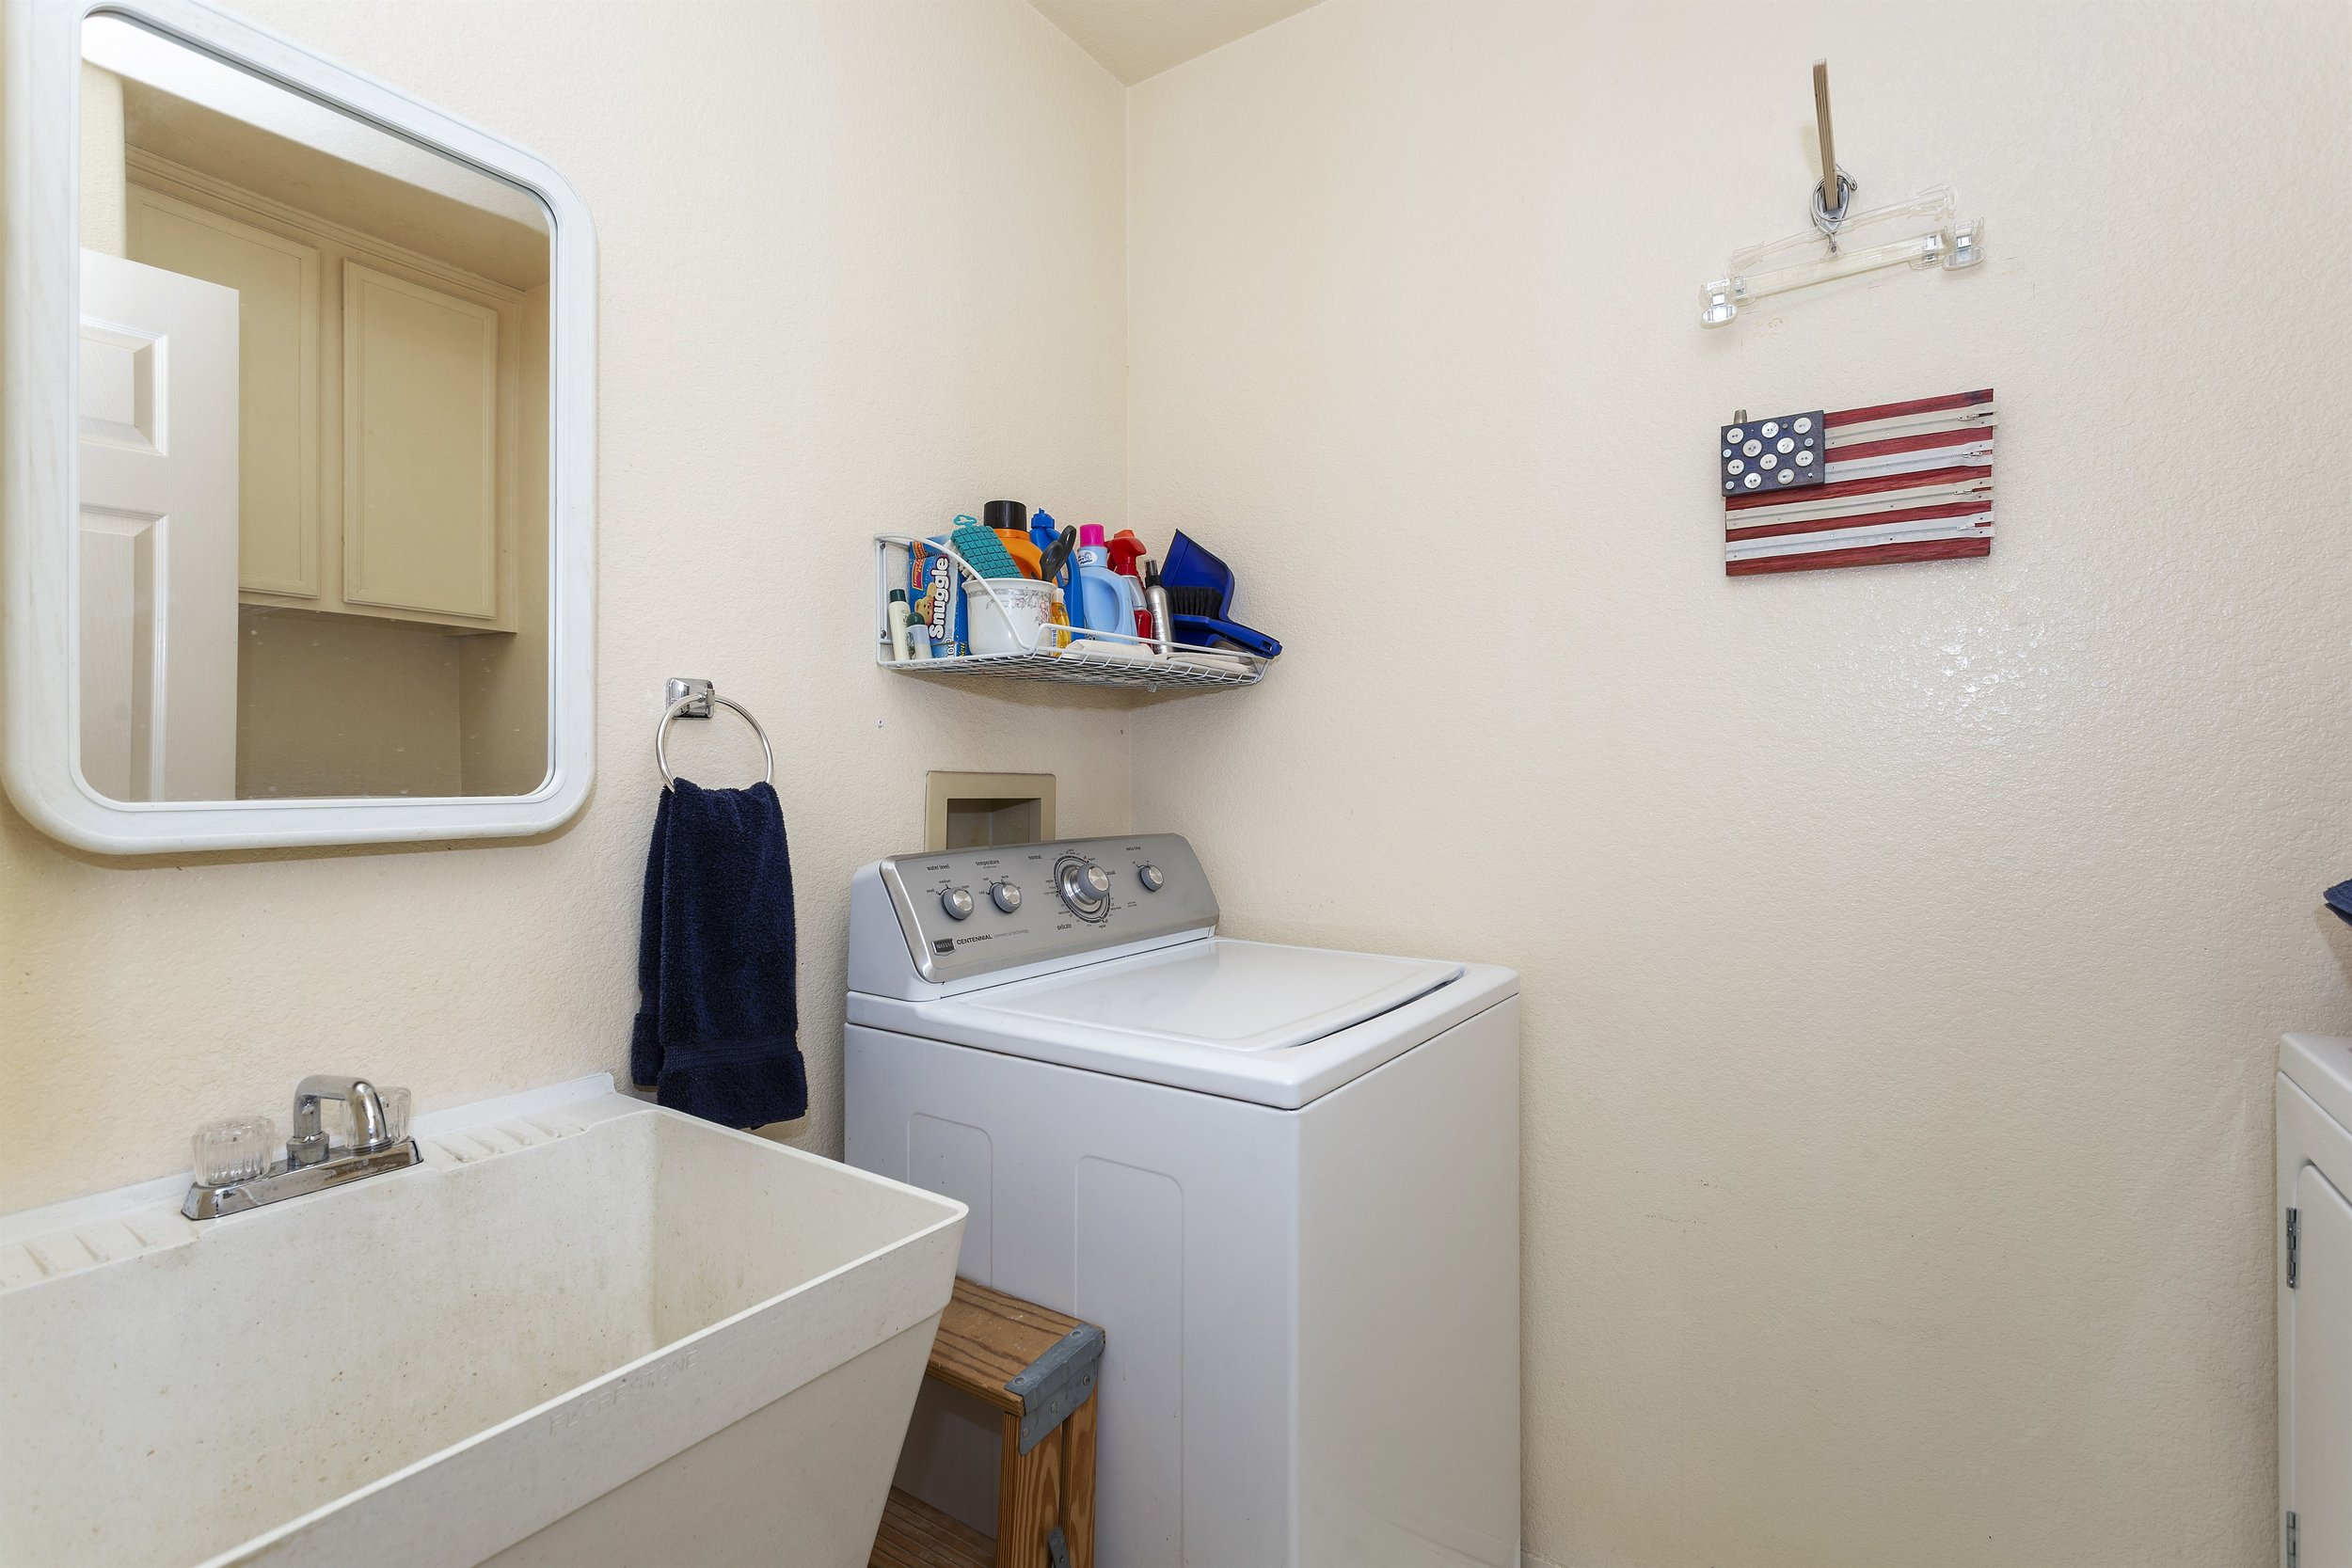 023_Laundry.jpg